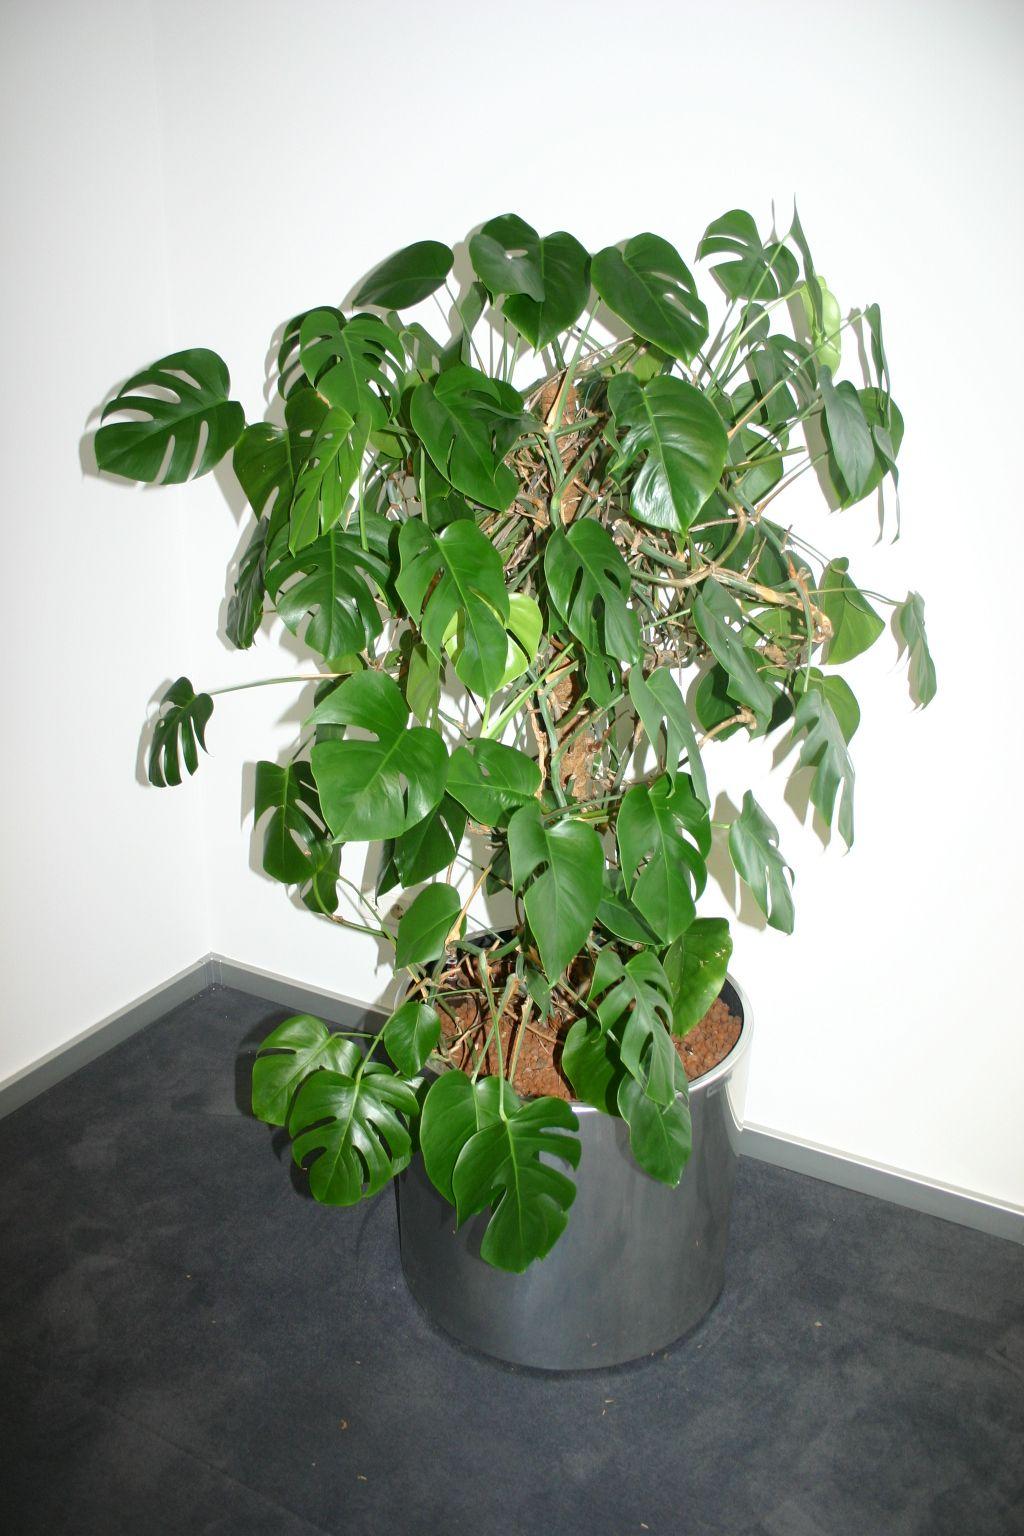 dekorative pflanze fensterblatt mit edelstahltopf. Black Bedroom Furniture Sets. Home Design Ideas